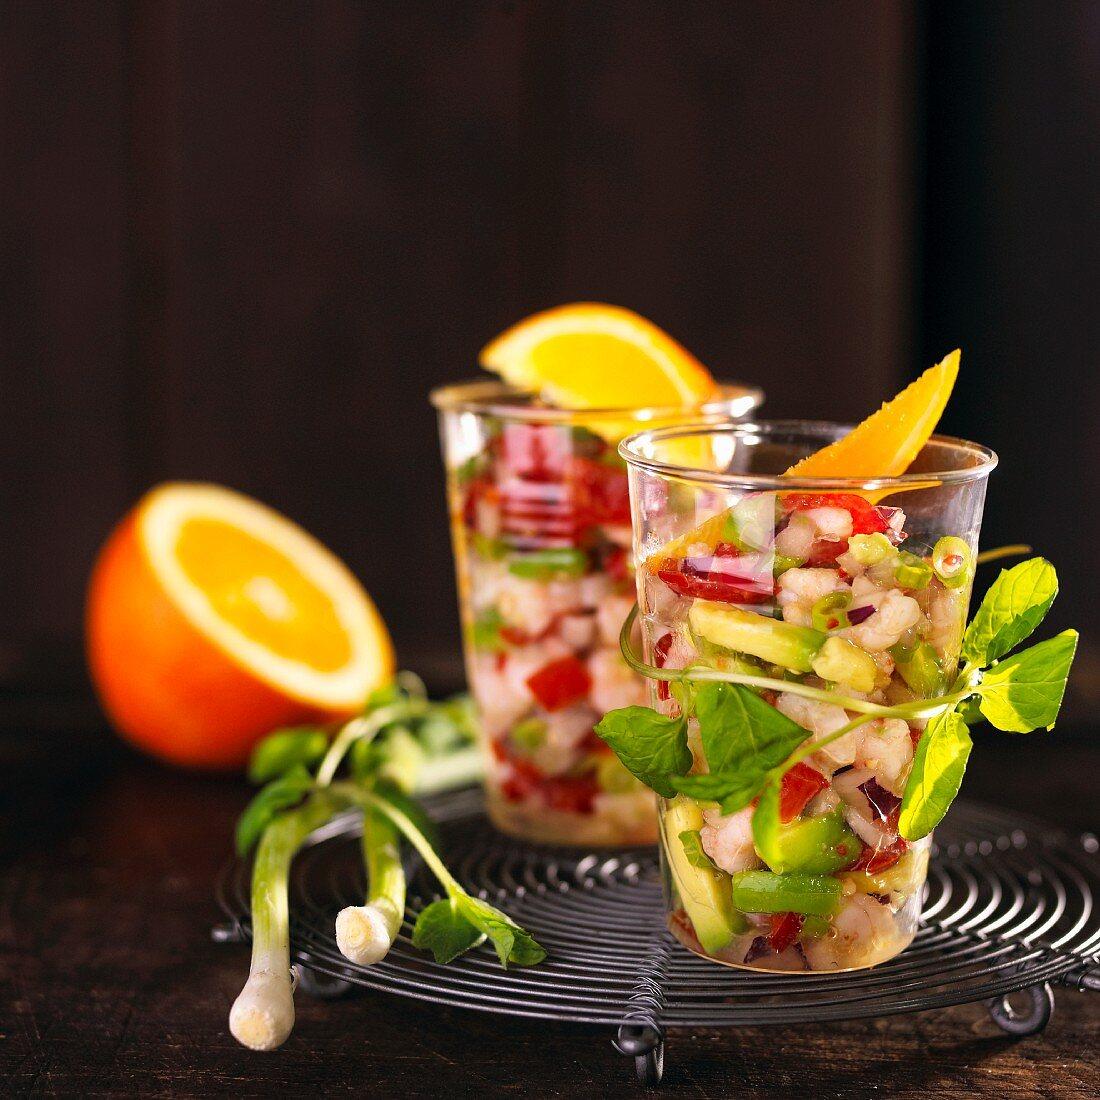 Avocado salad with prawns (Mexico)